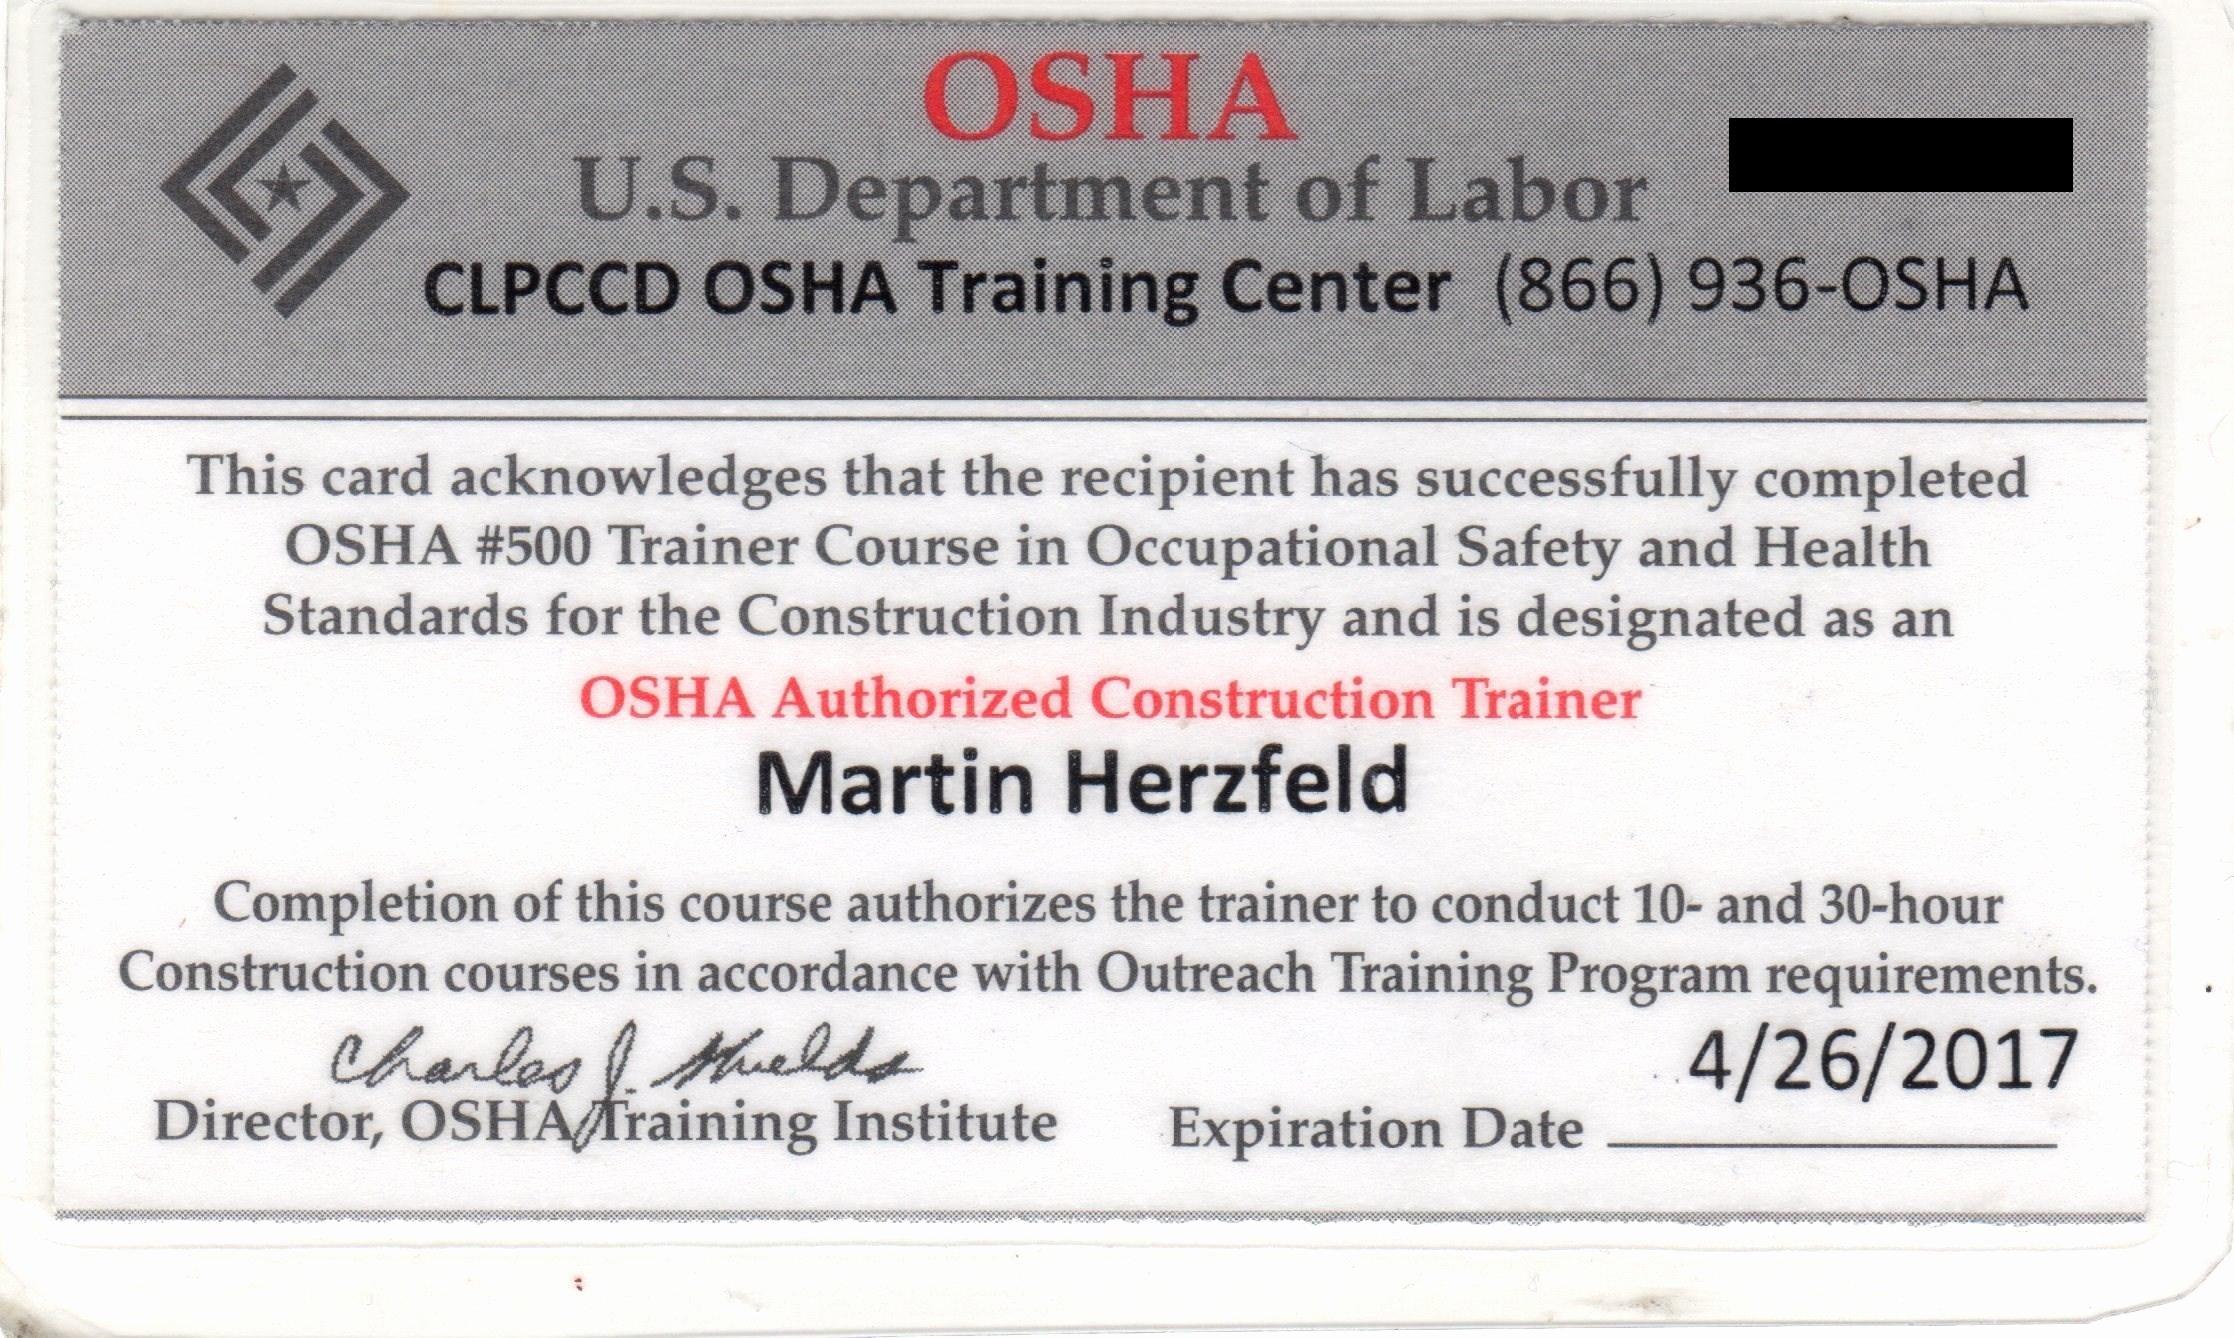 Osha 10 Certificate Template Unique Licensed solar Contractor & Project Consultant Licensed